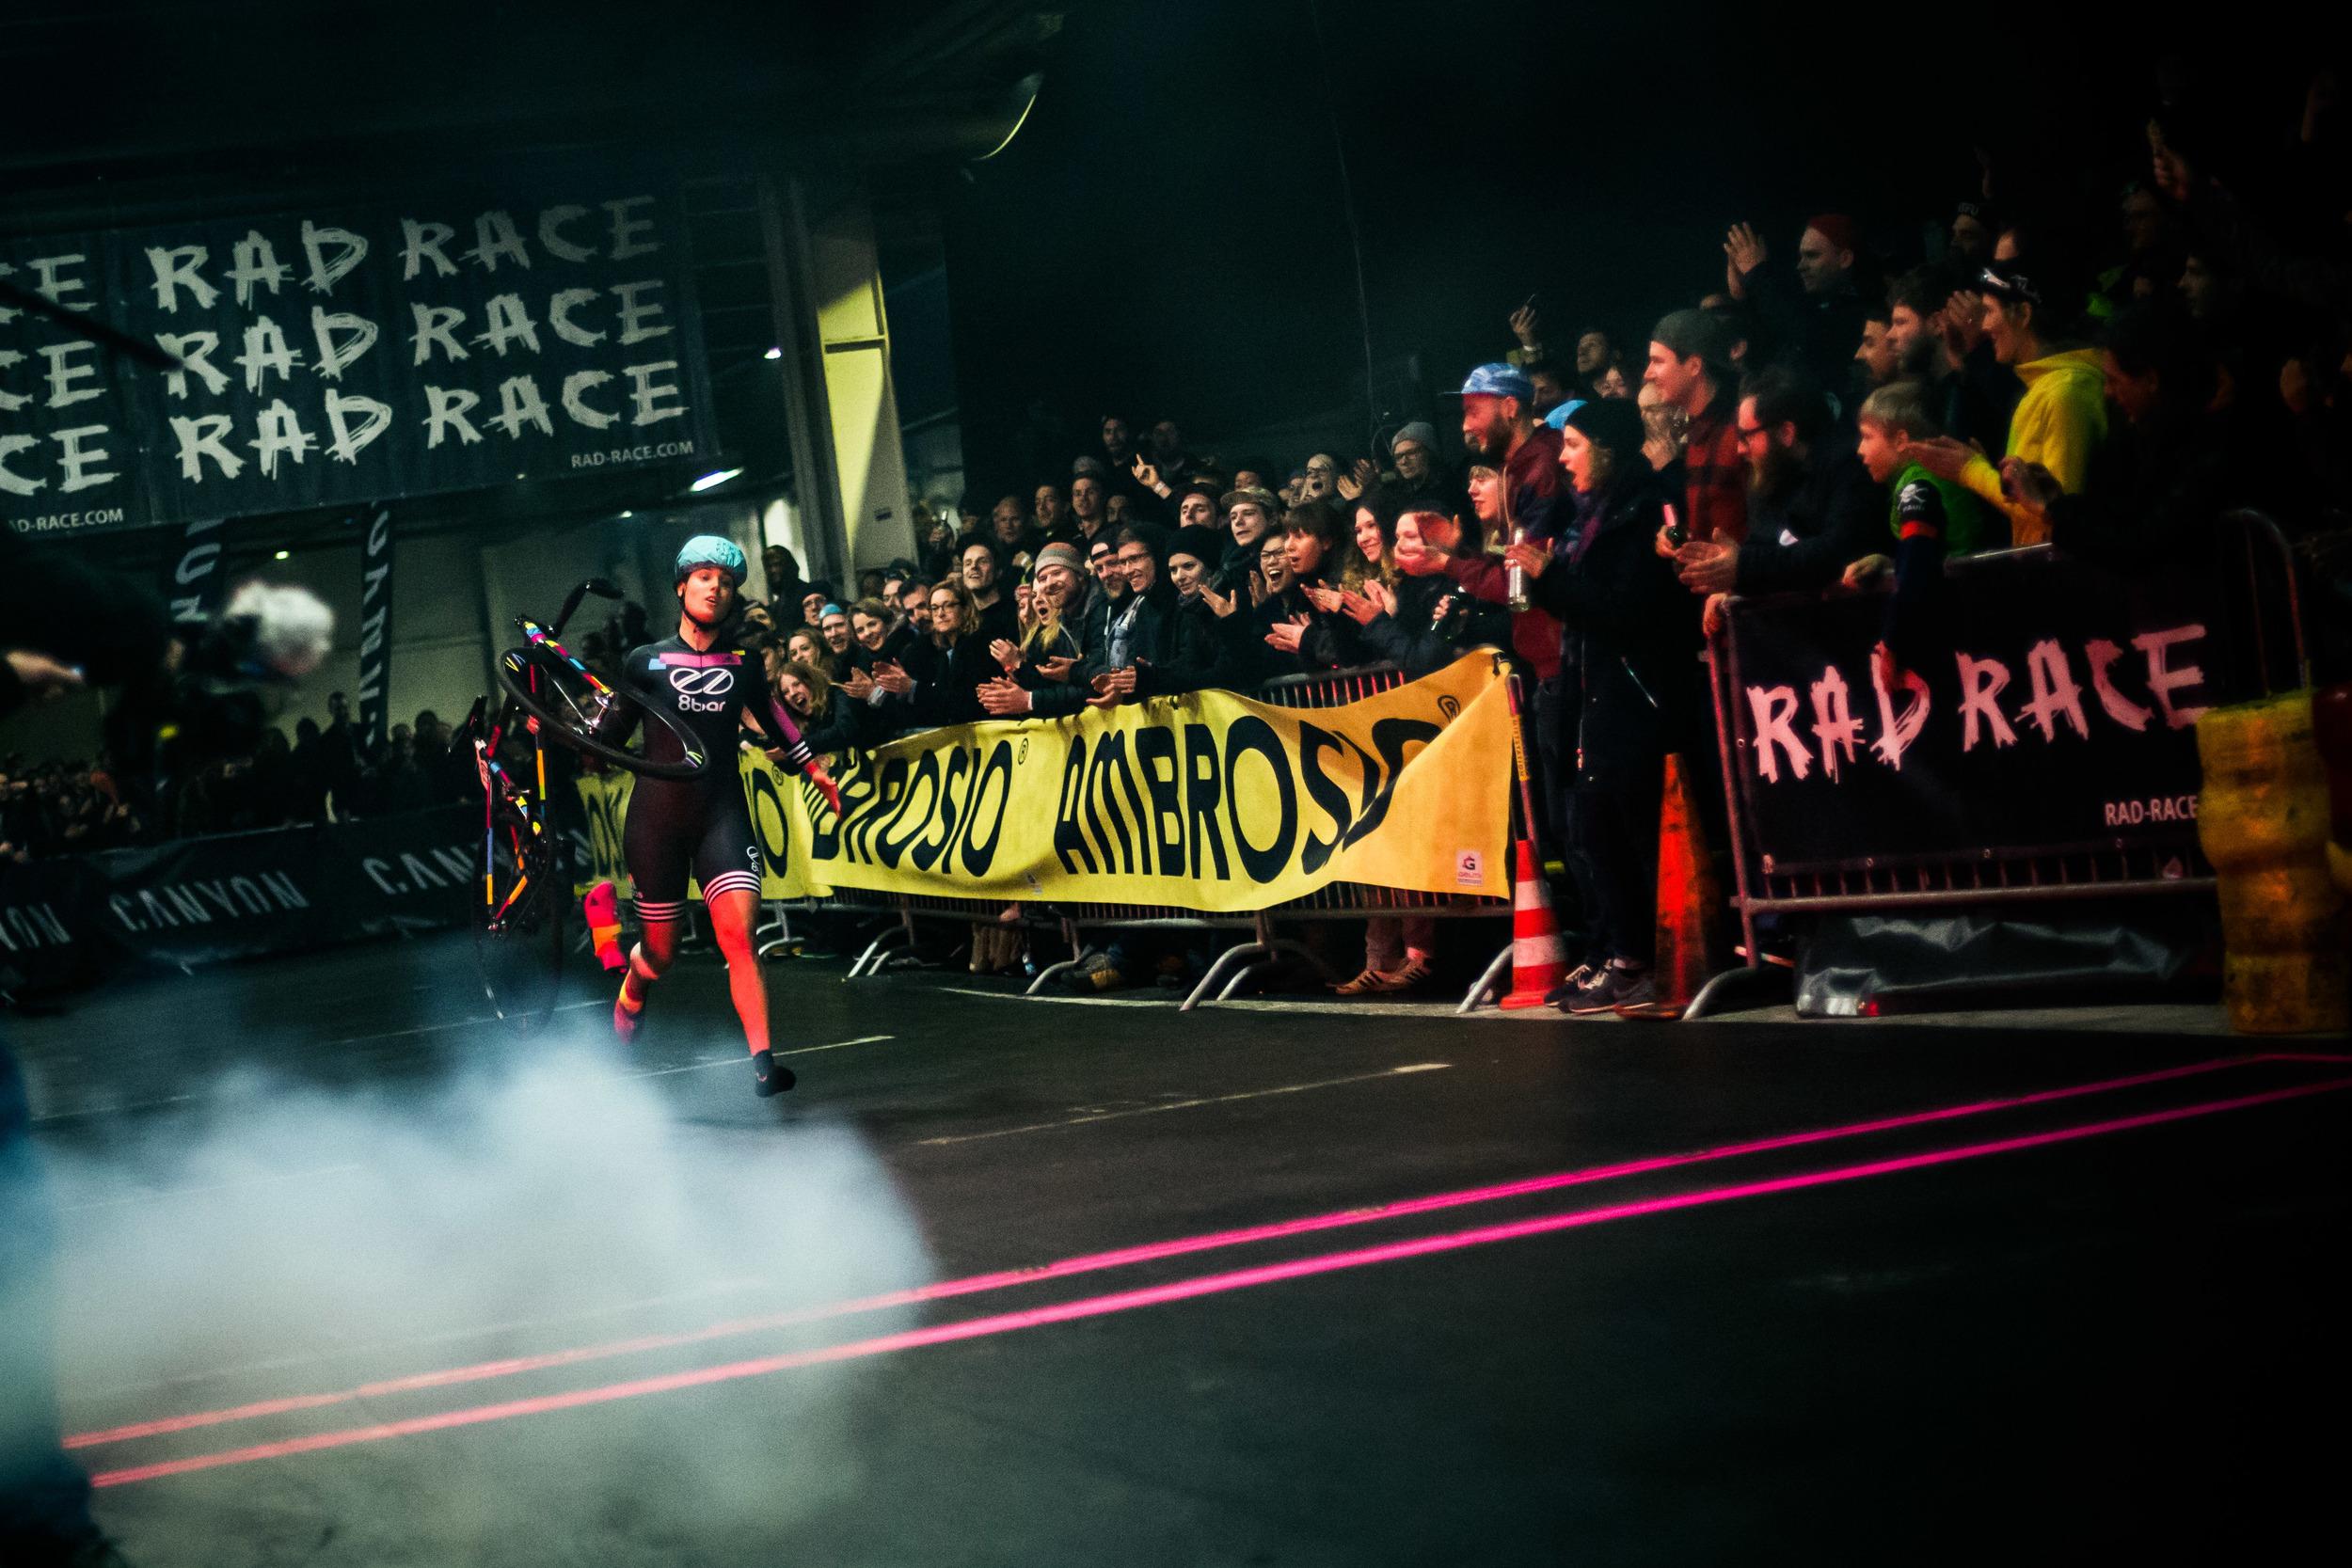 RAD RACE Last Man Standing, Berlin March 19 2016 - Shot by Bengt Stiller 9.jpg